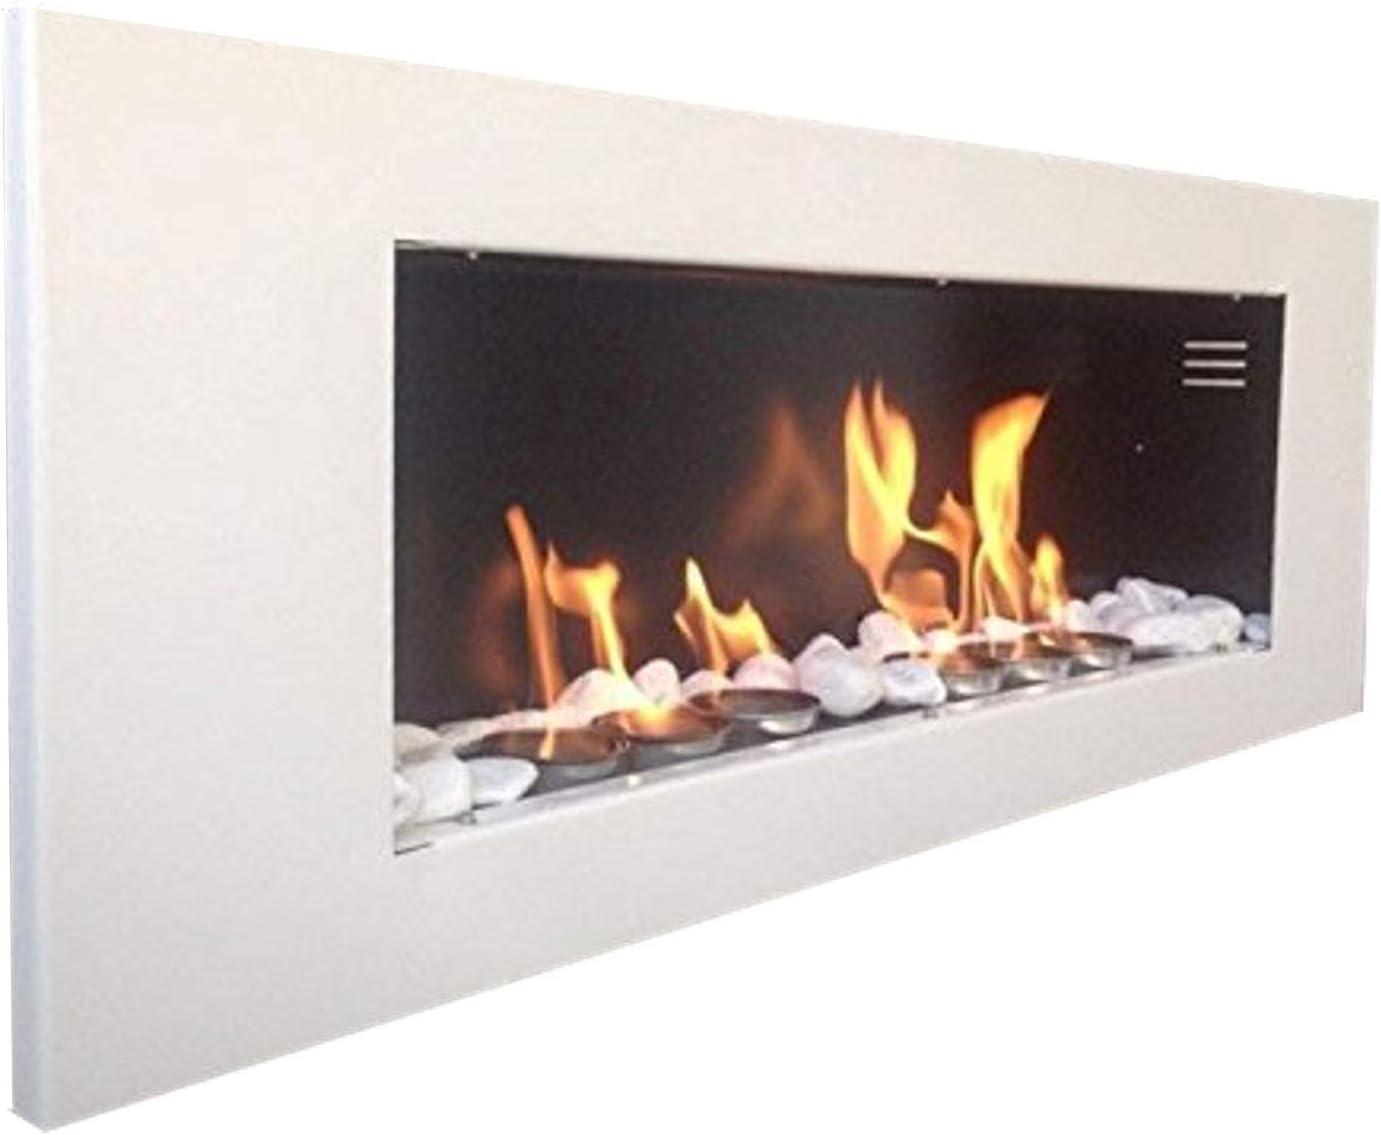 Biokamin Plus White Wall ethanol fireplace Bioethanol Fireplace XXL FREE 24/Decorative Stones